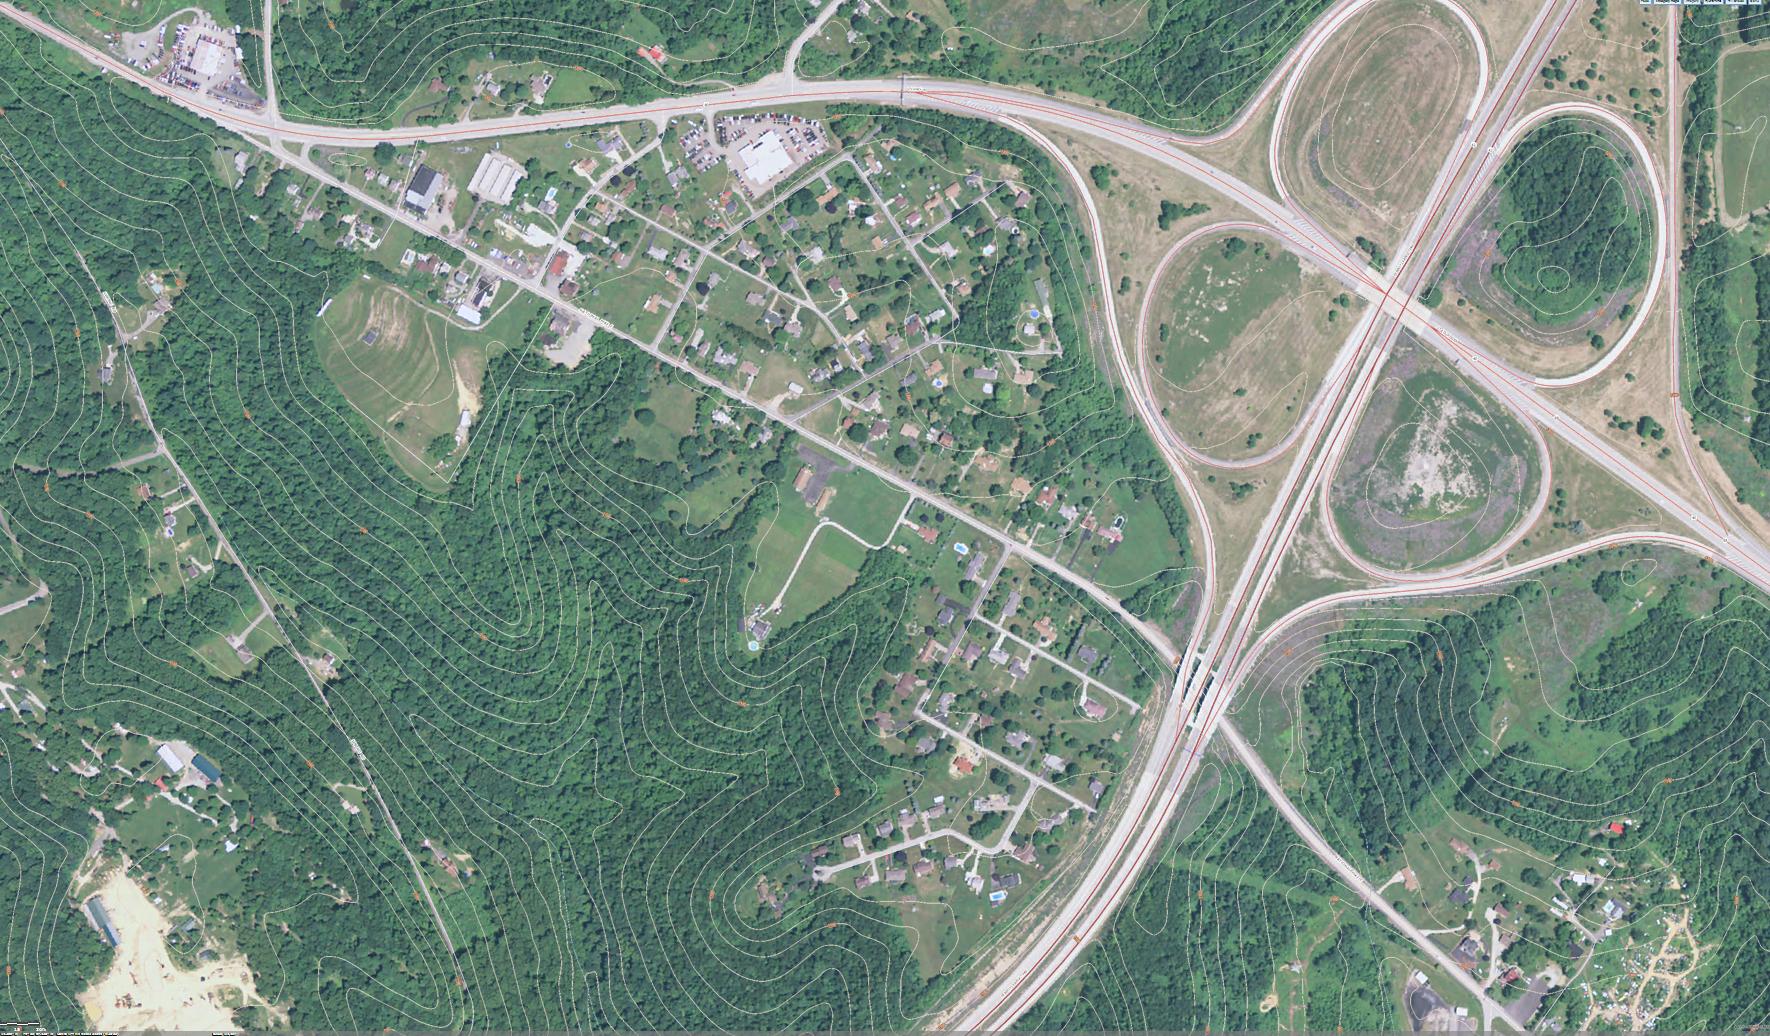 FileUSGS Topo MapMalden Neighborhood Of Centerville Region - Pa us map